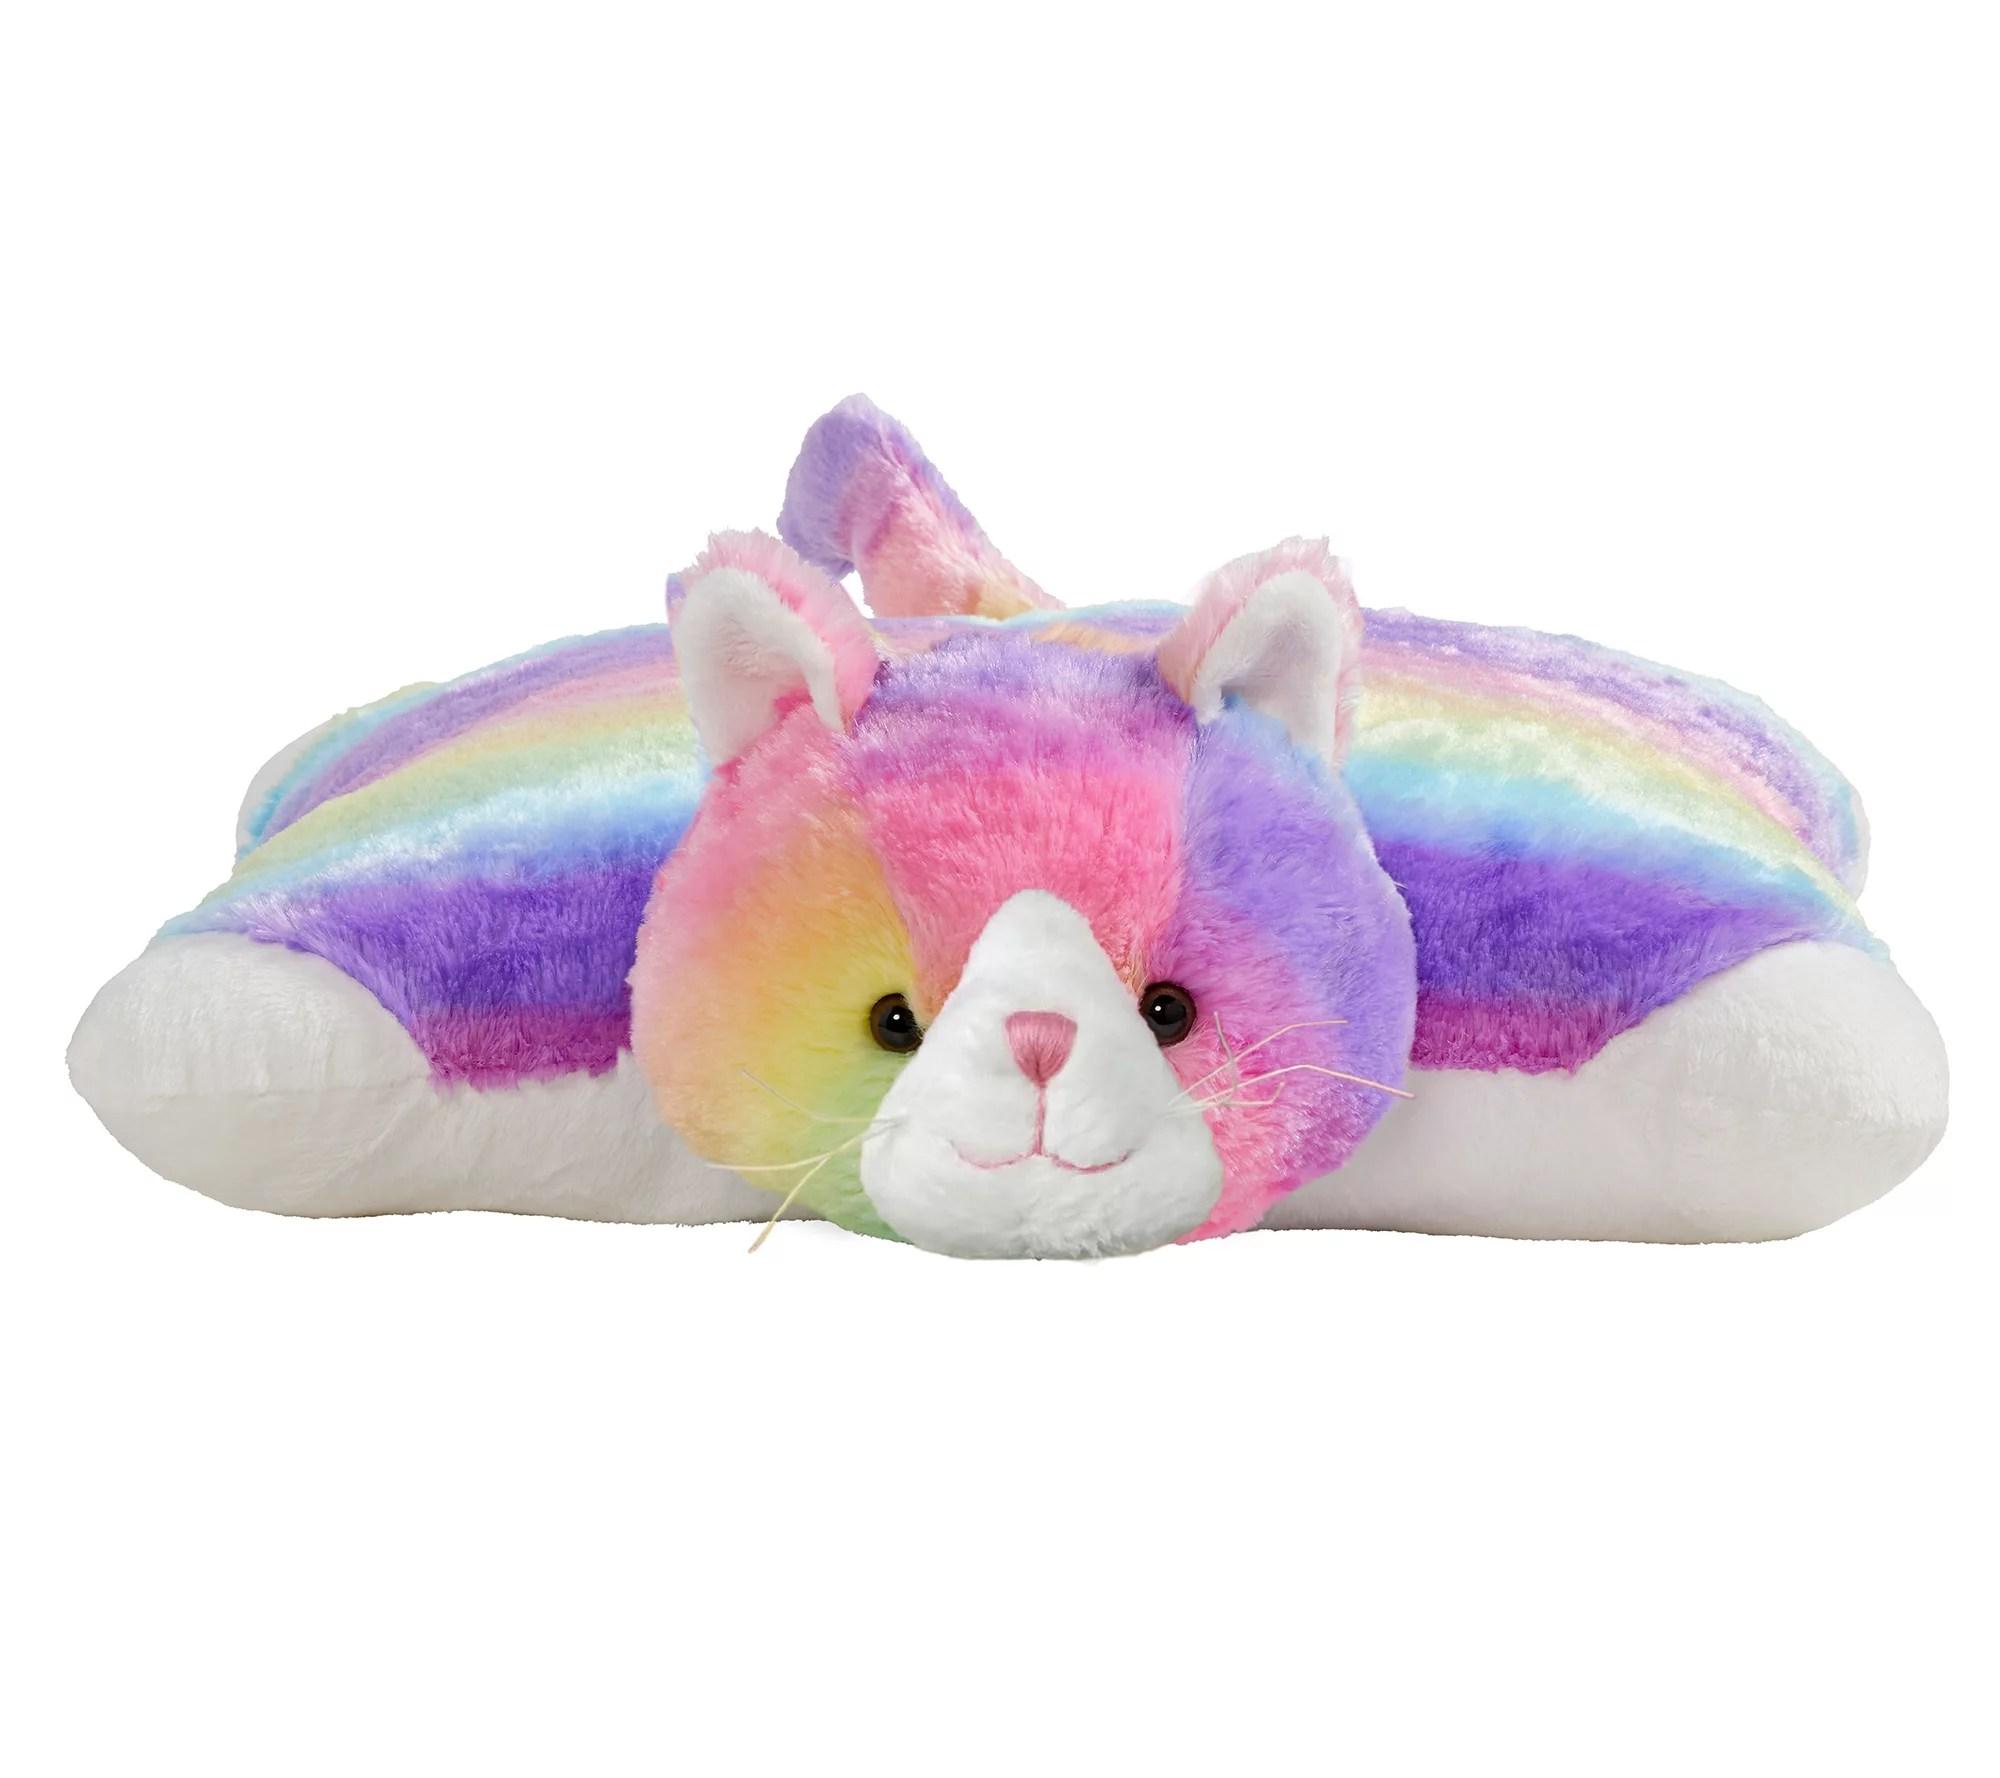 pillow pets originals cosmic cat stuffed animalplush toy qvc com